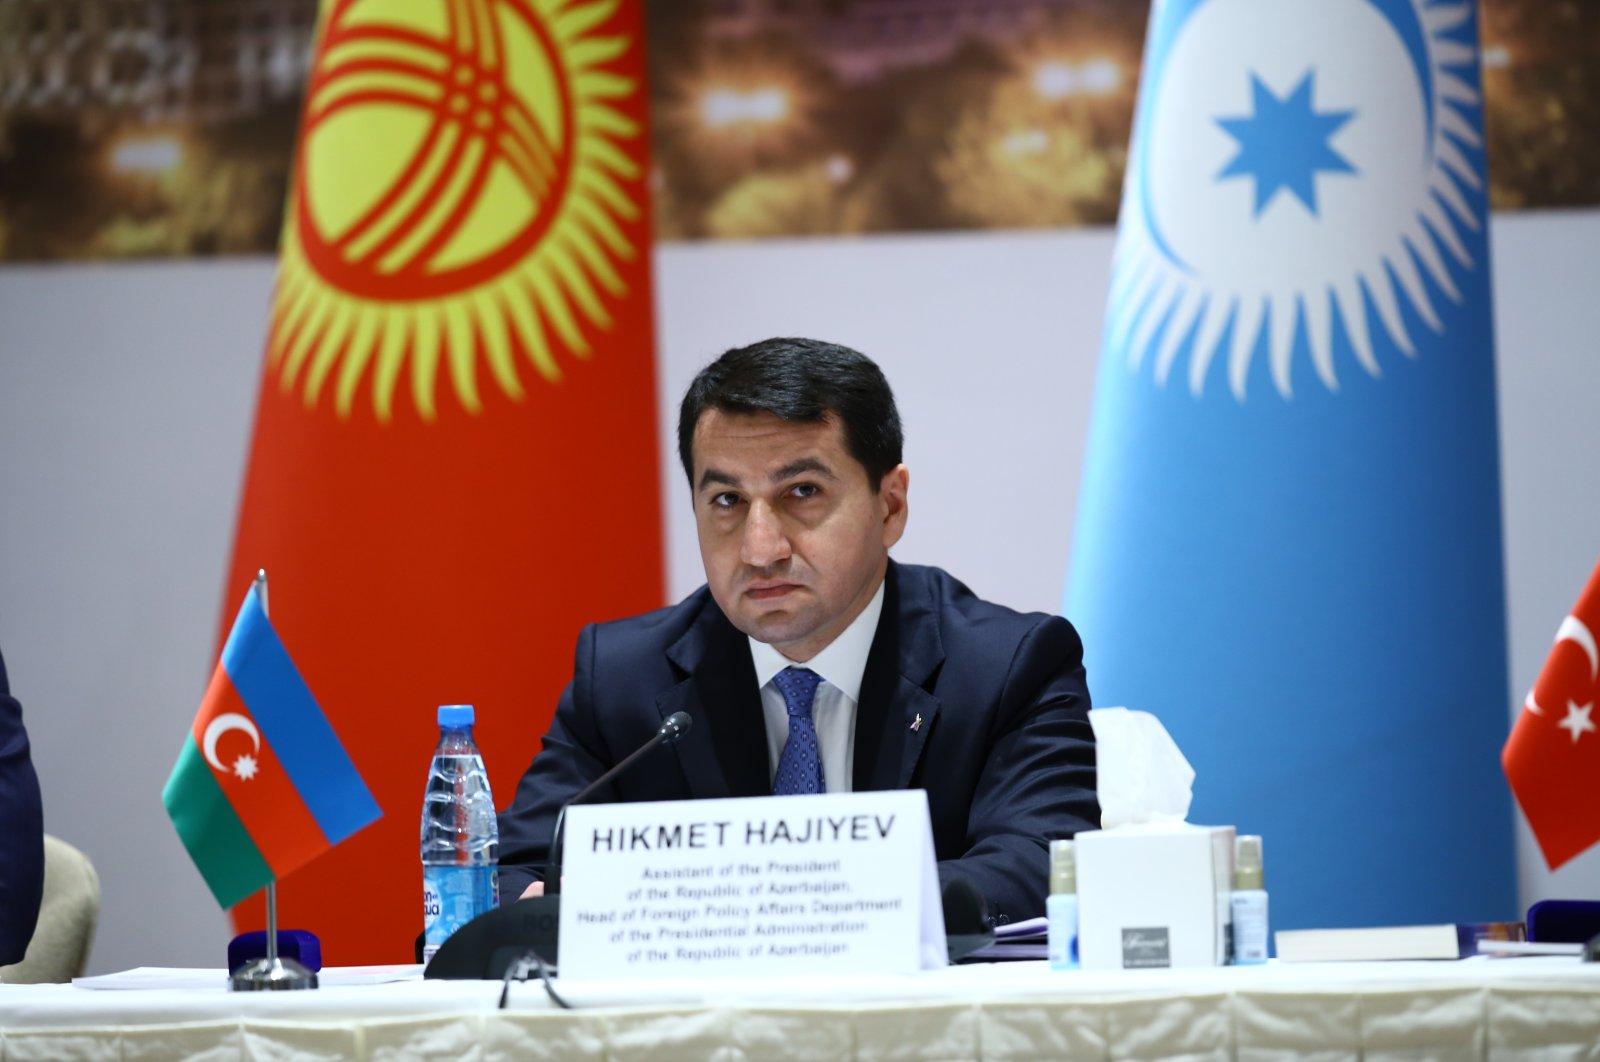 Azerbaijani presidential aide Hikmet Hajiyev speaking at the Turkic Council in the capital Baku, Azerbaijan, April 10, 2021. (AA Photo)